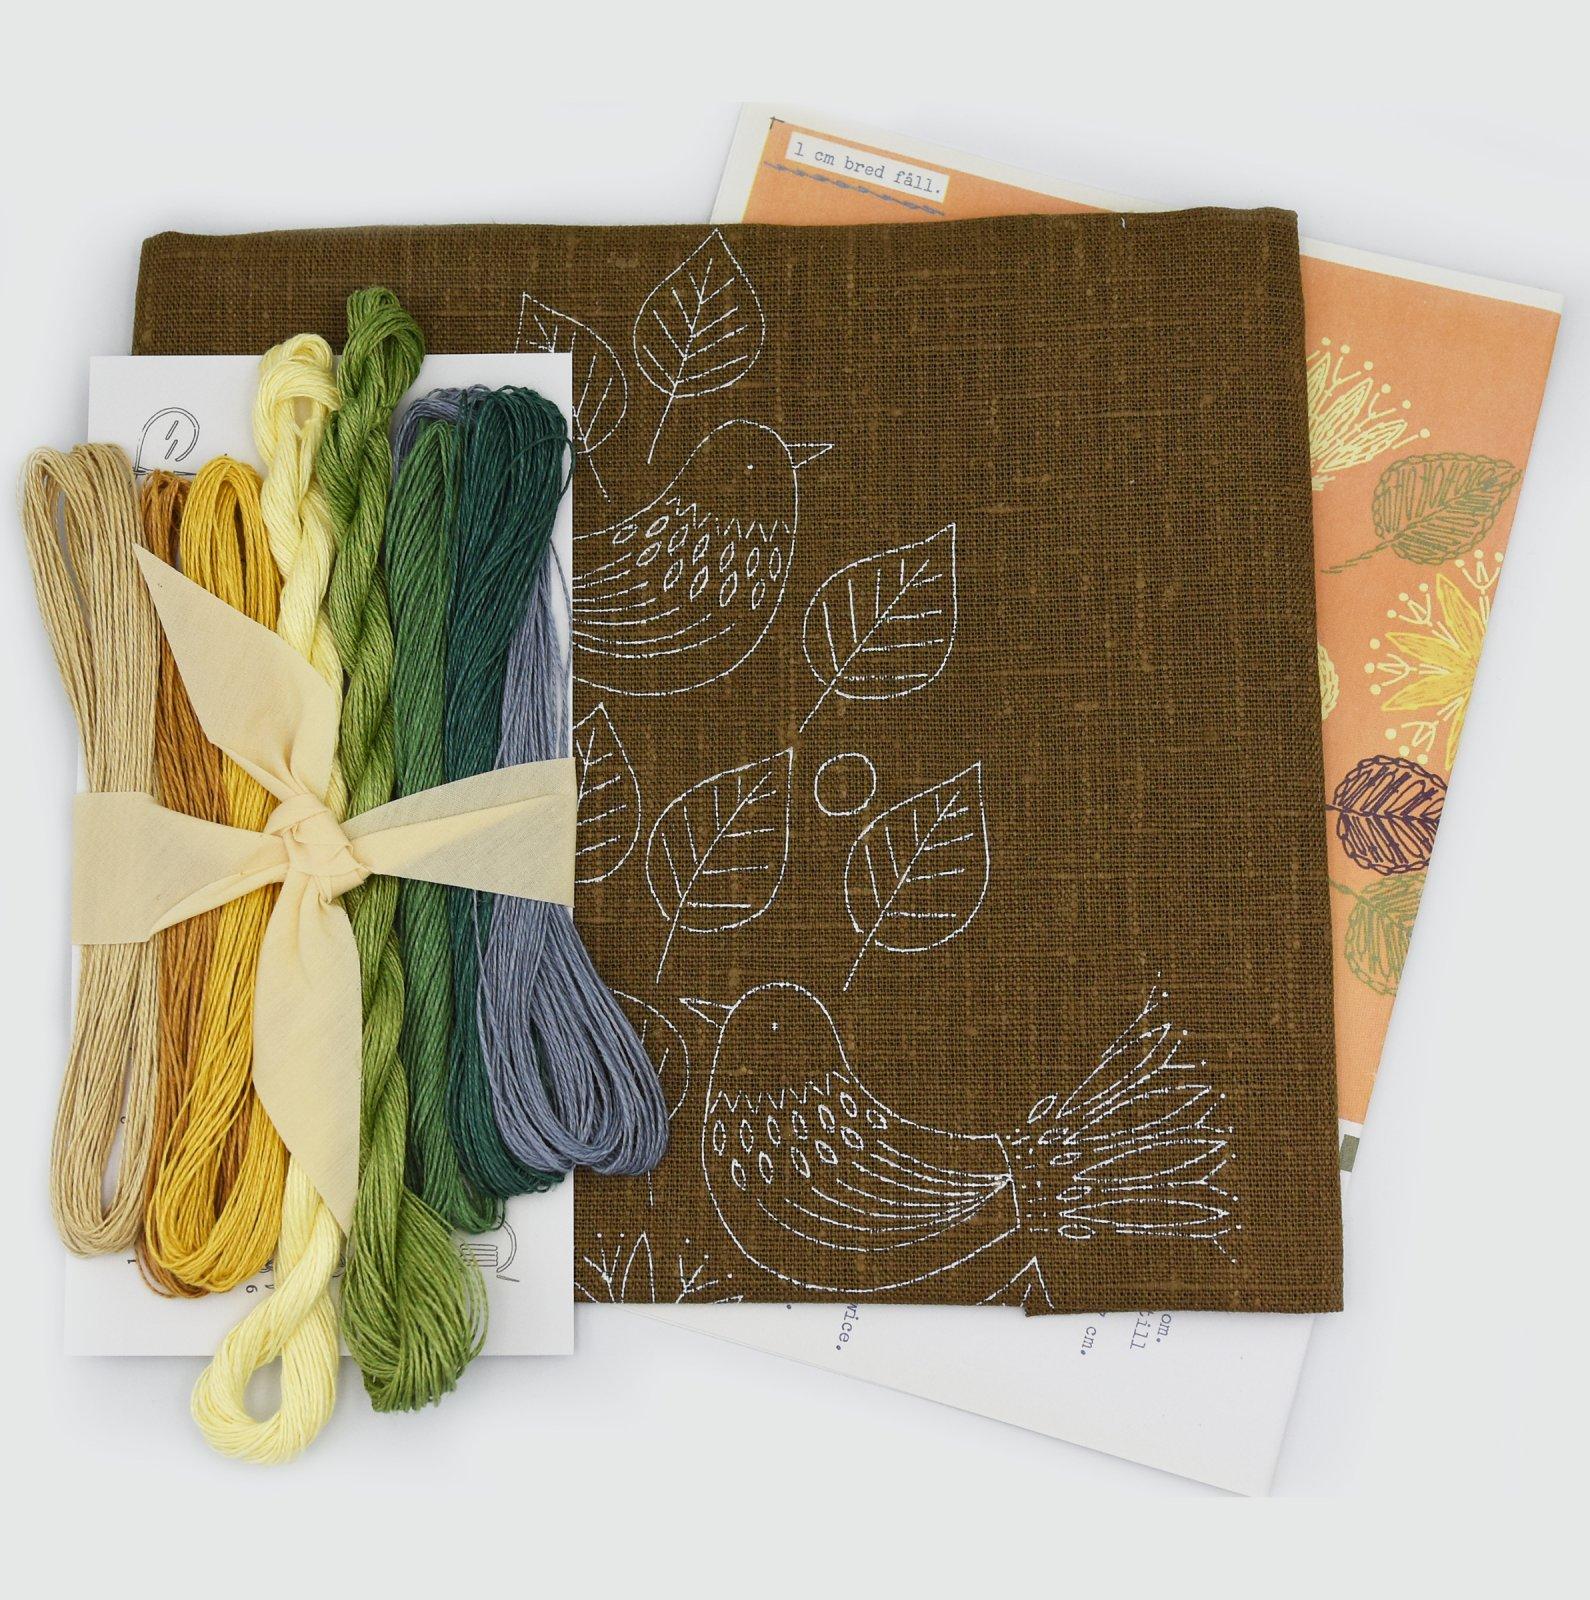 Linladan - Woodland Sparrows - Nordiska print with linen threads